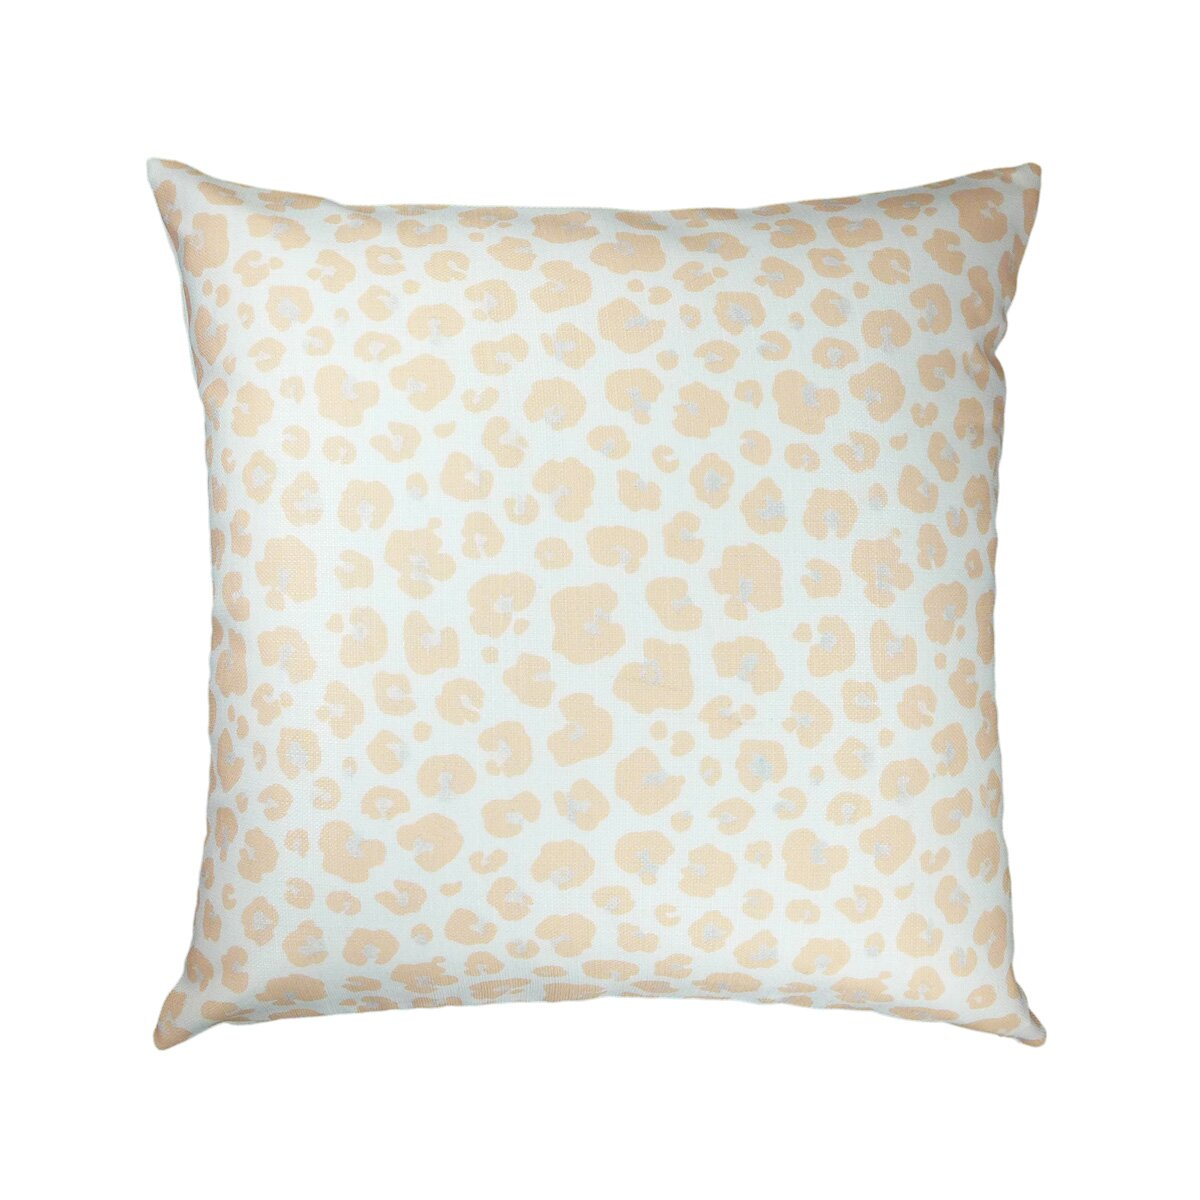 NECTARmodern Animal Print Zebra/Leopard Peach Throw Pillow & Reviews Wayfair